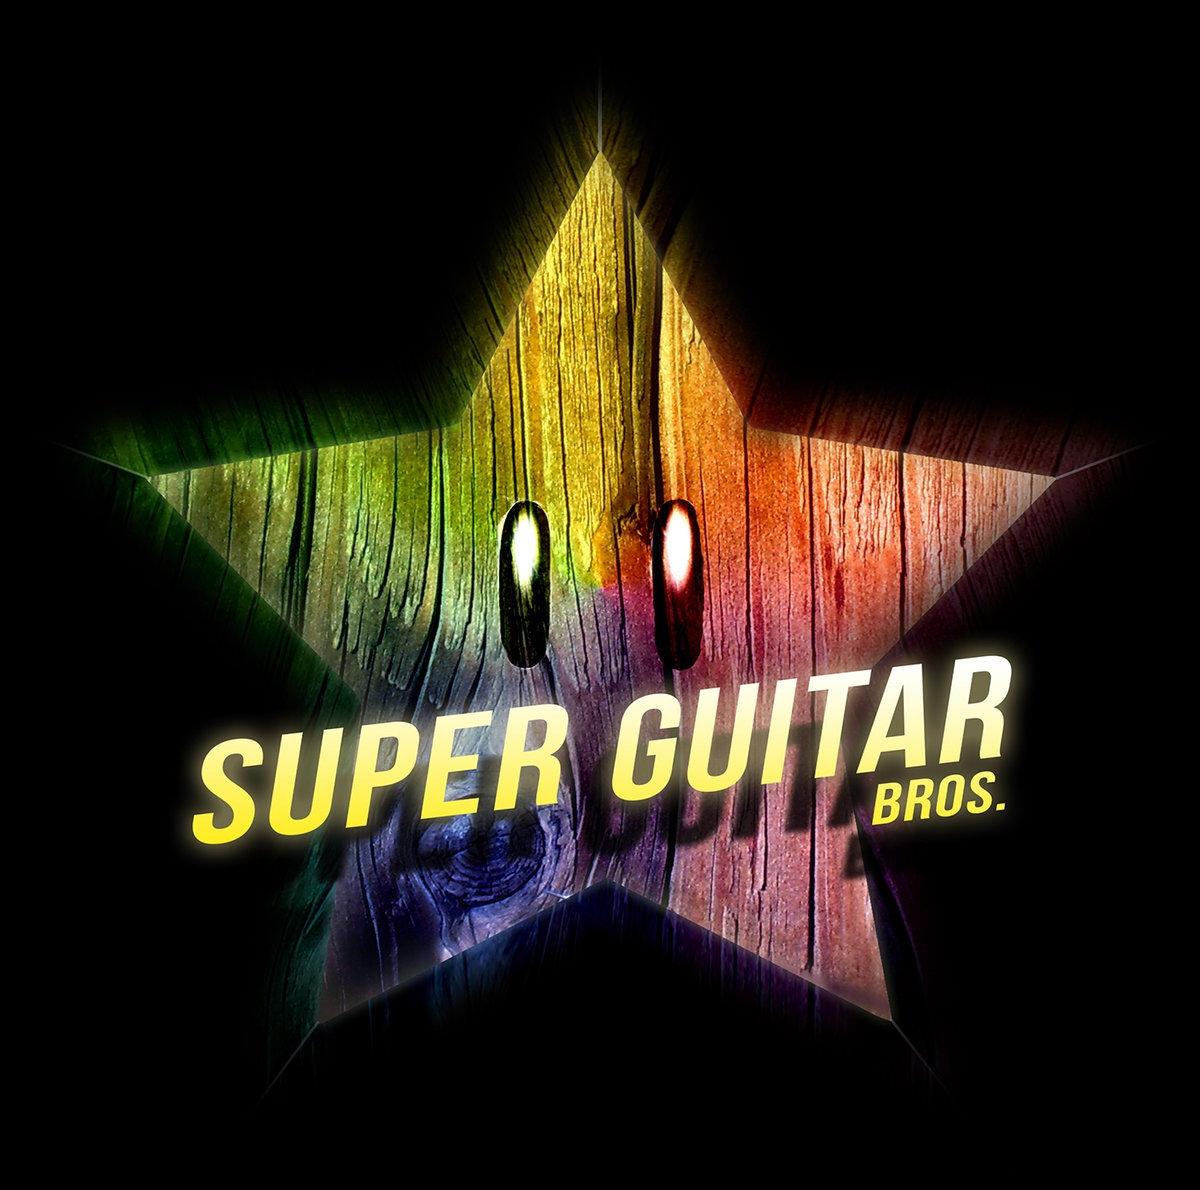 Super Guitar Bros | Super Guitar Bros